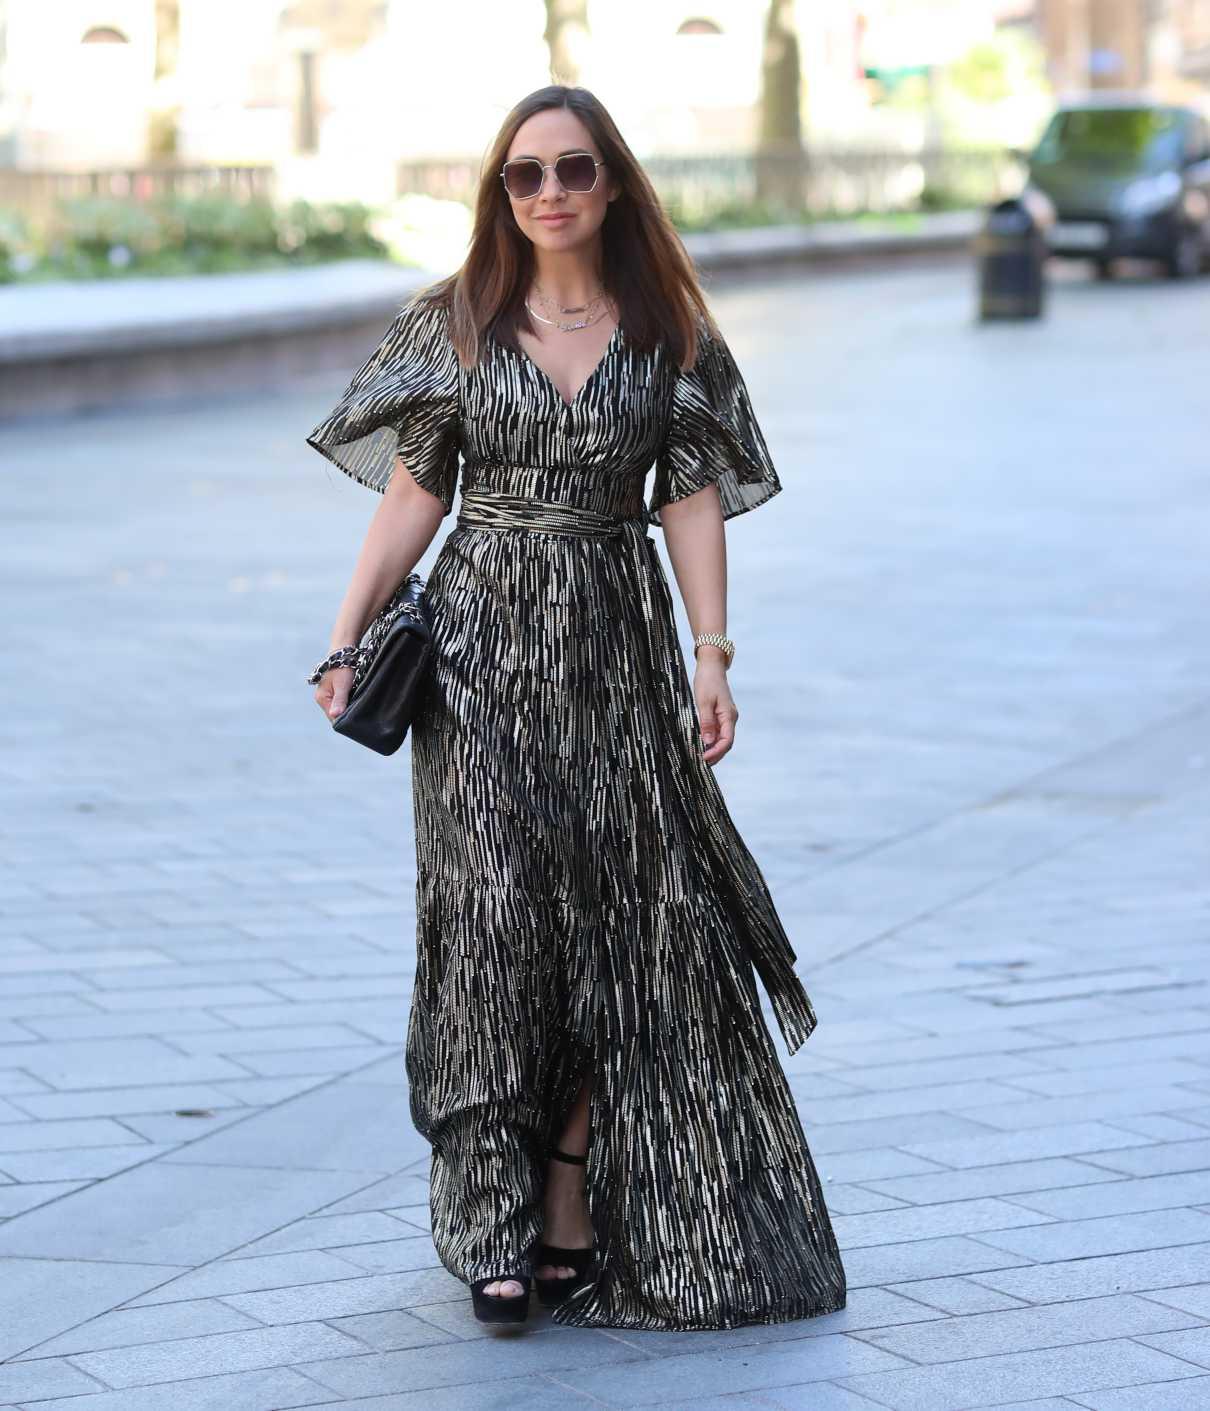 Myleene Klass in a Gray Metallic Dress